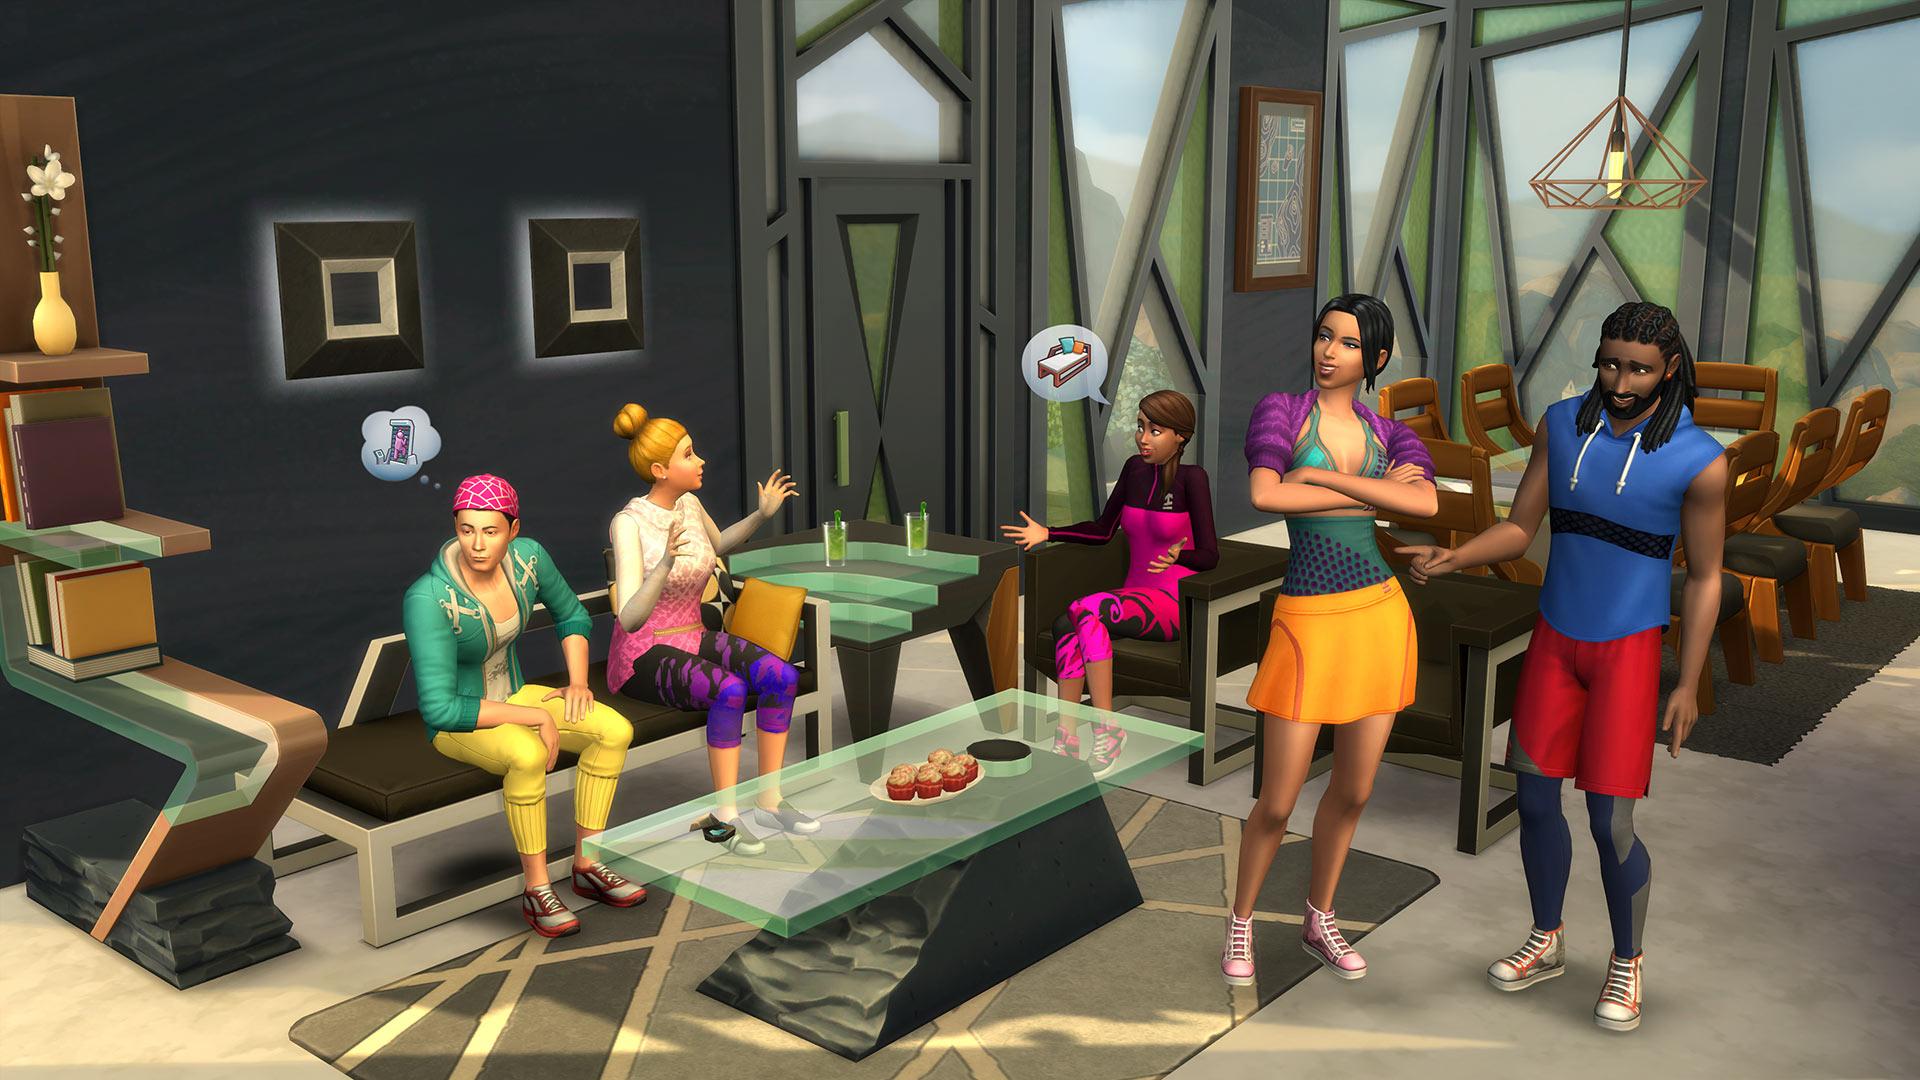 62ca91e020b The Sims 4  How one man makes a living off Sims mods - Vox